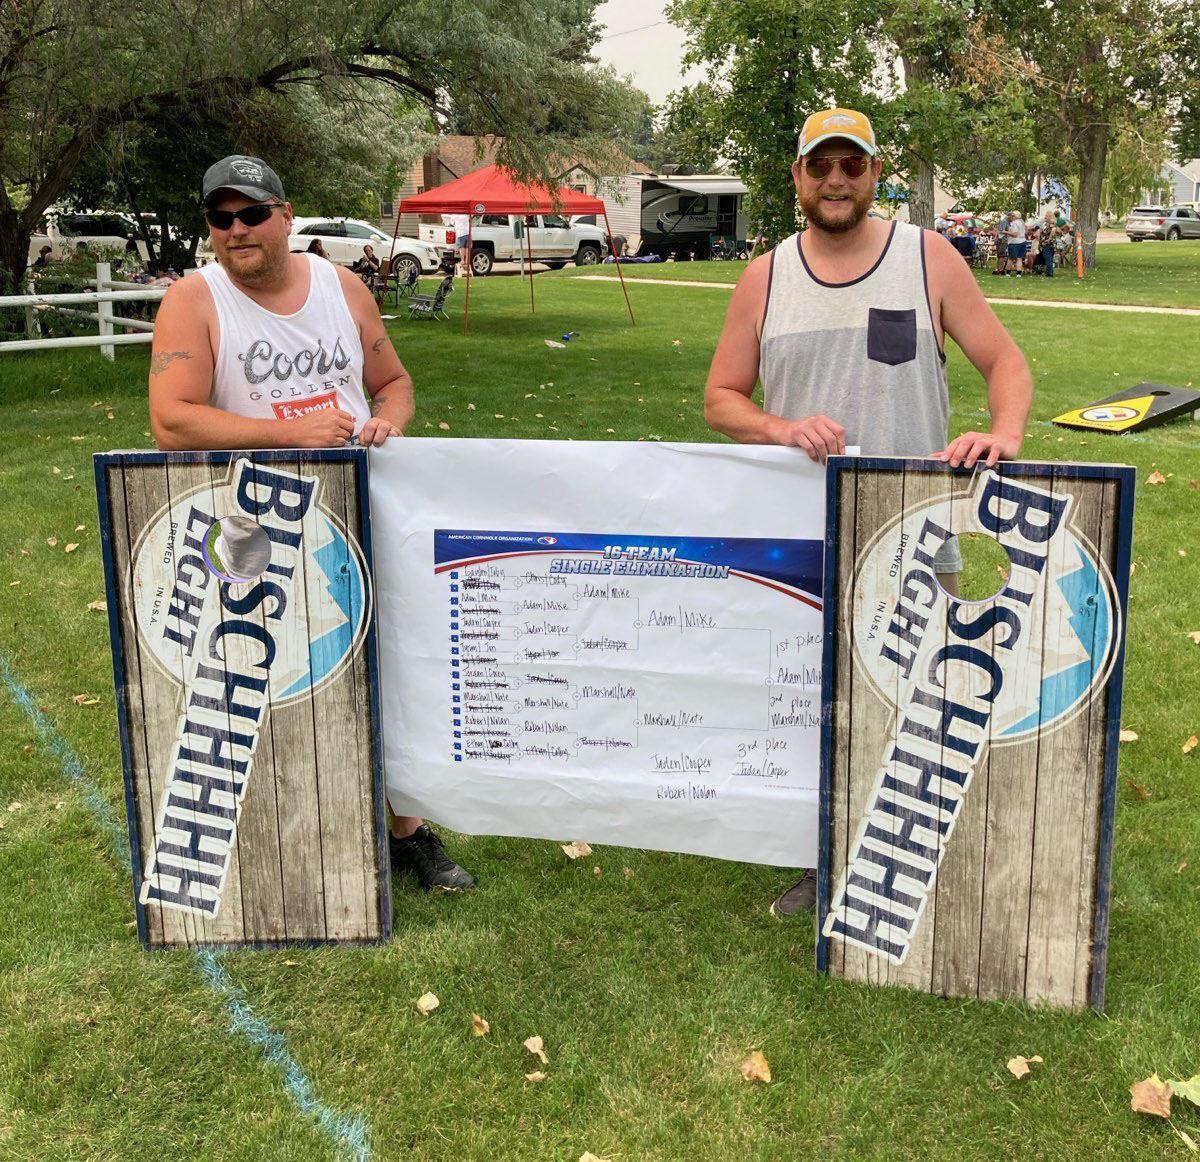 Corn-hole winners